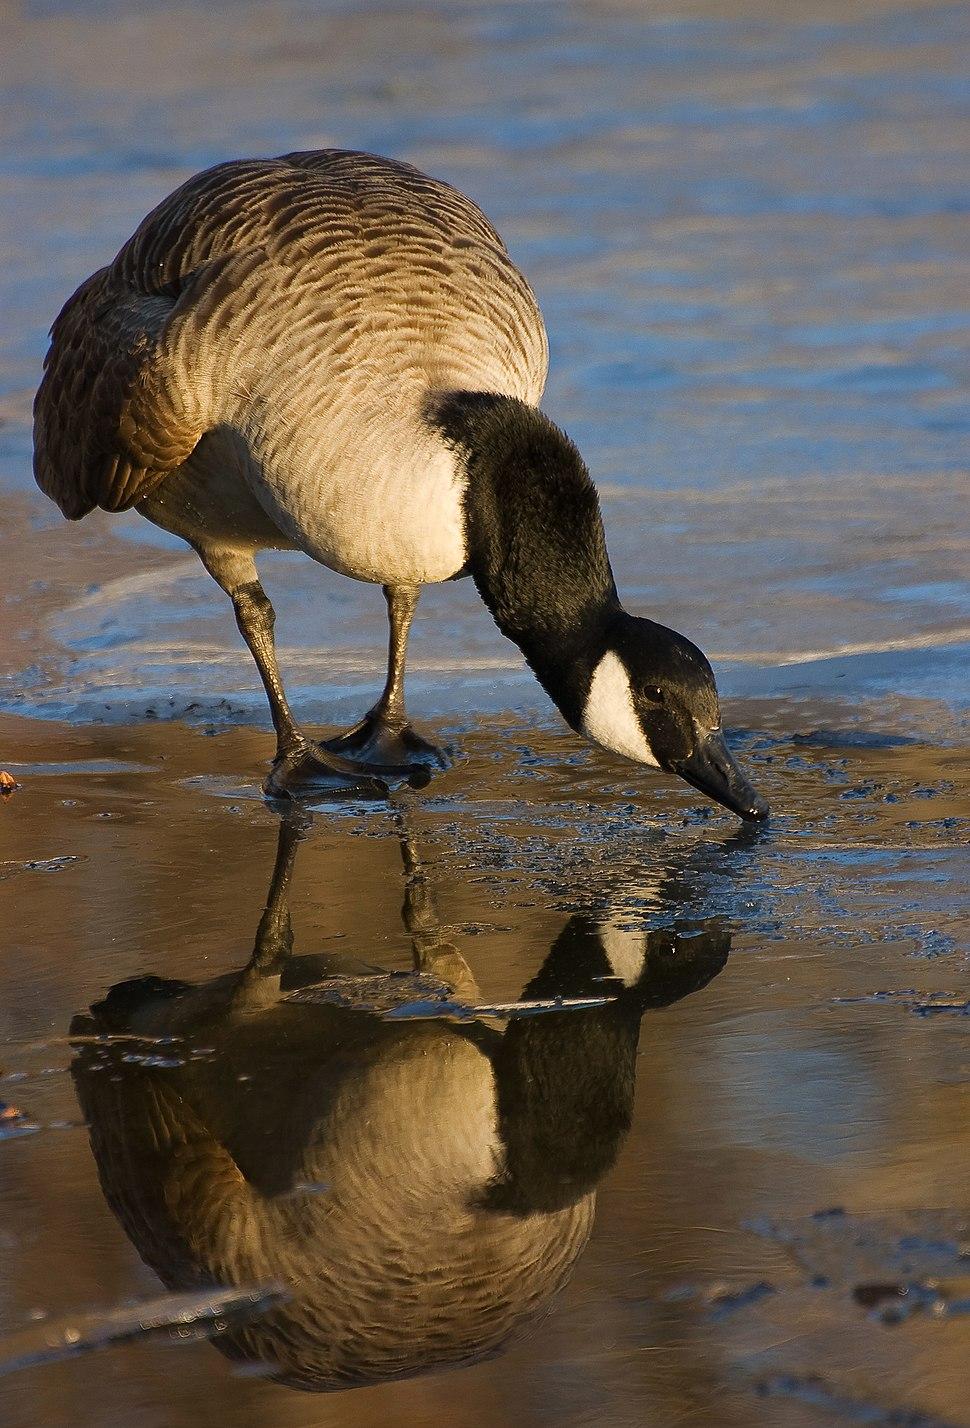 Canada goose reflection 03